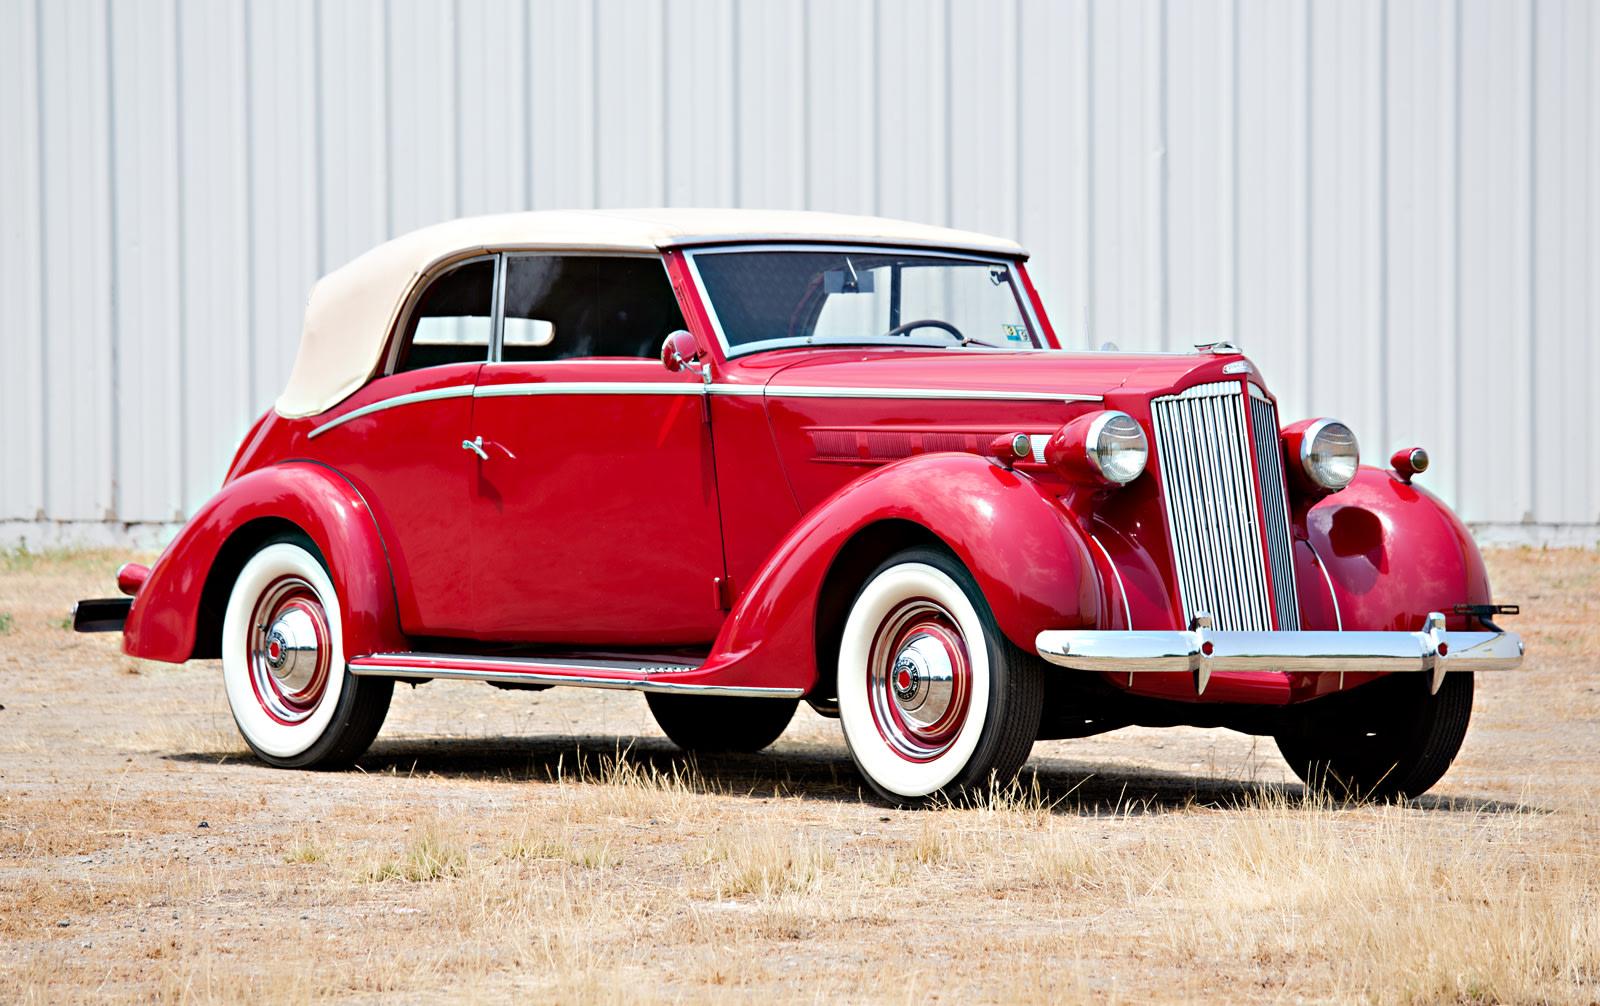 1937 Packard 115-C Cabriolet